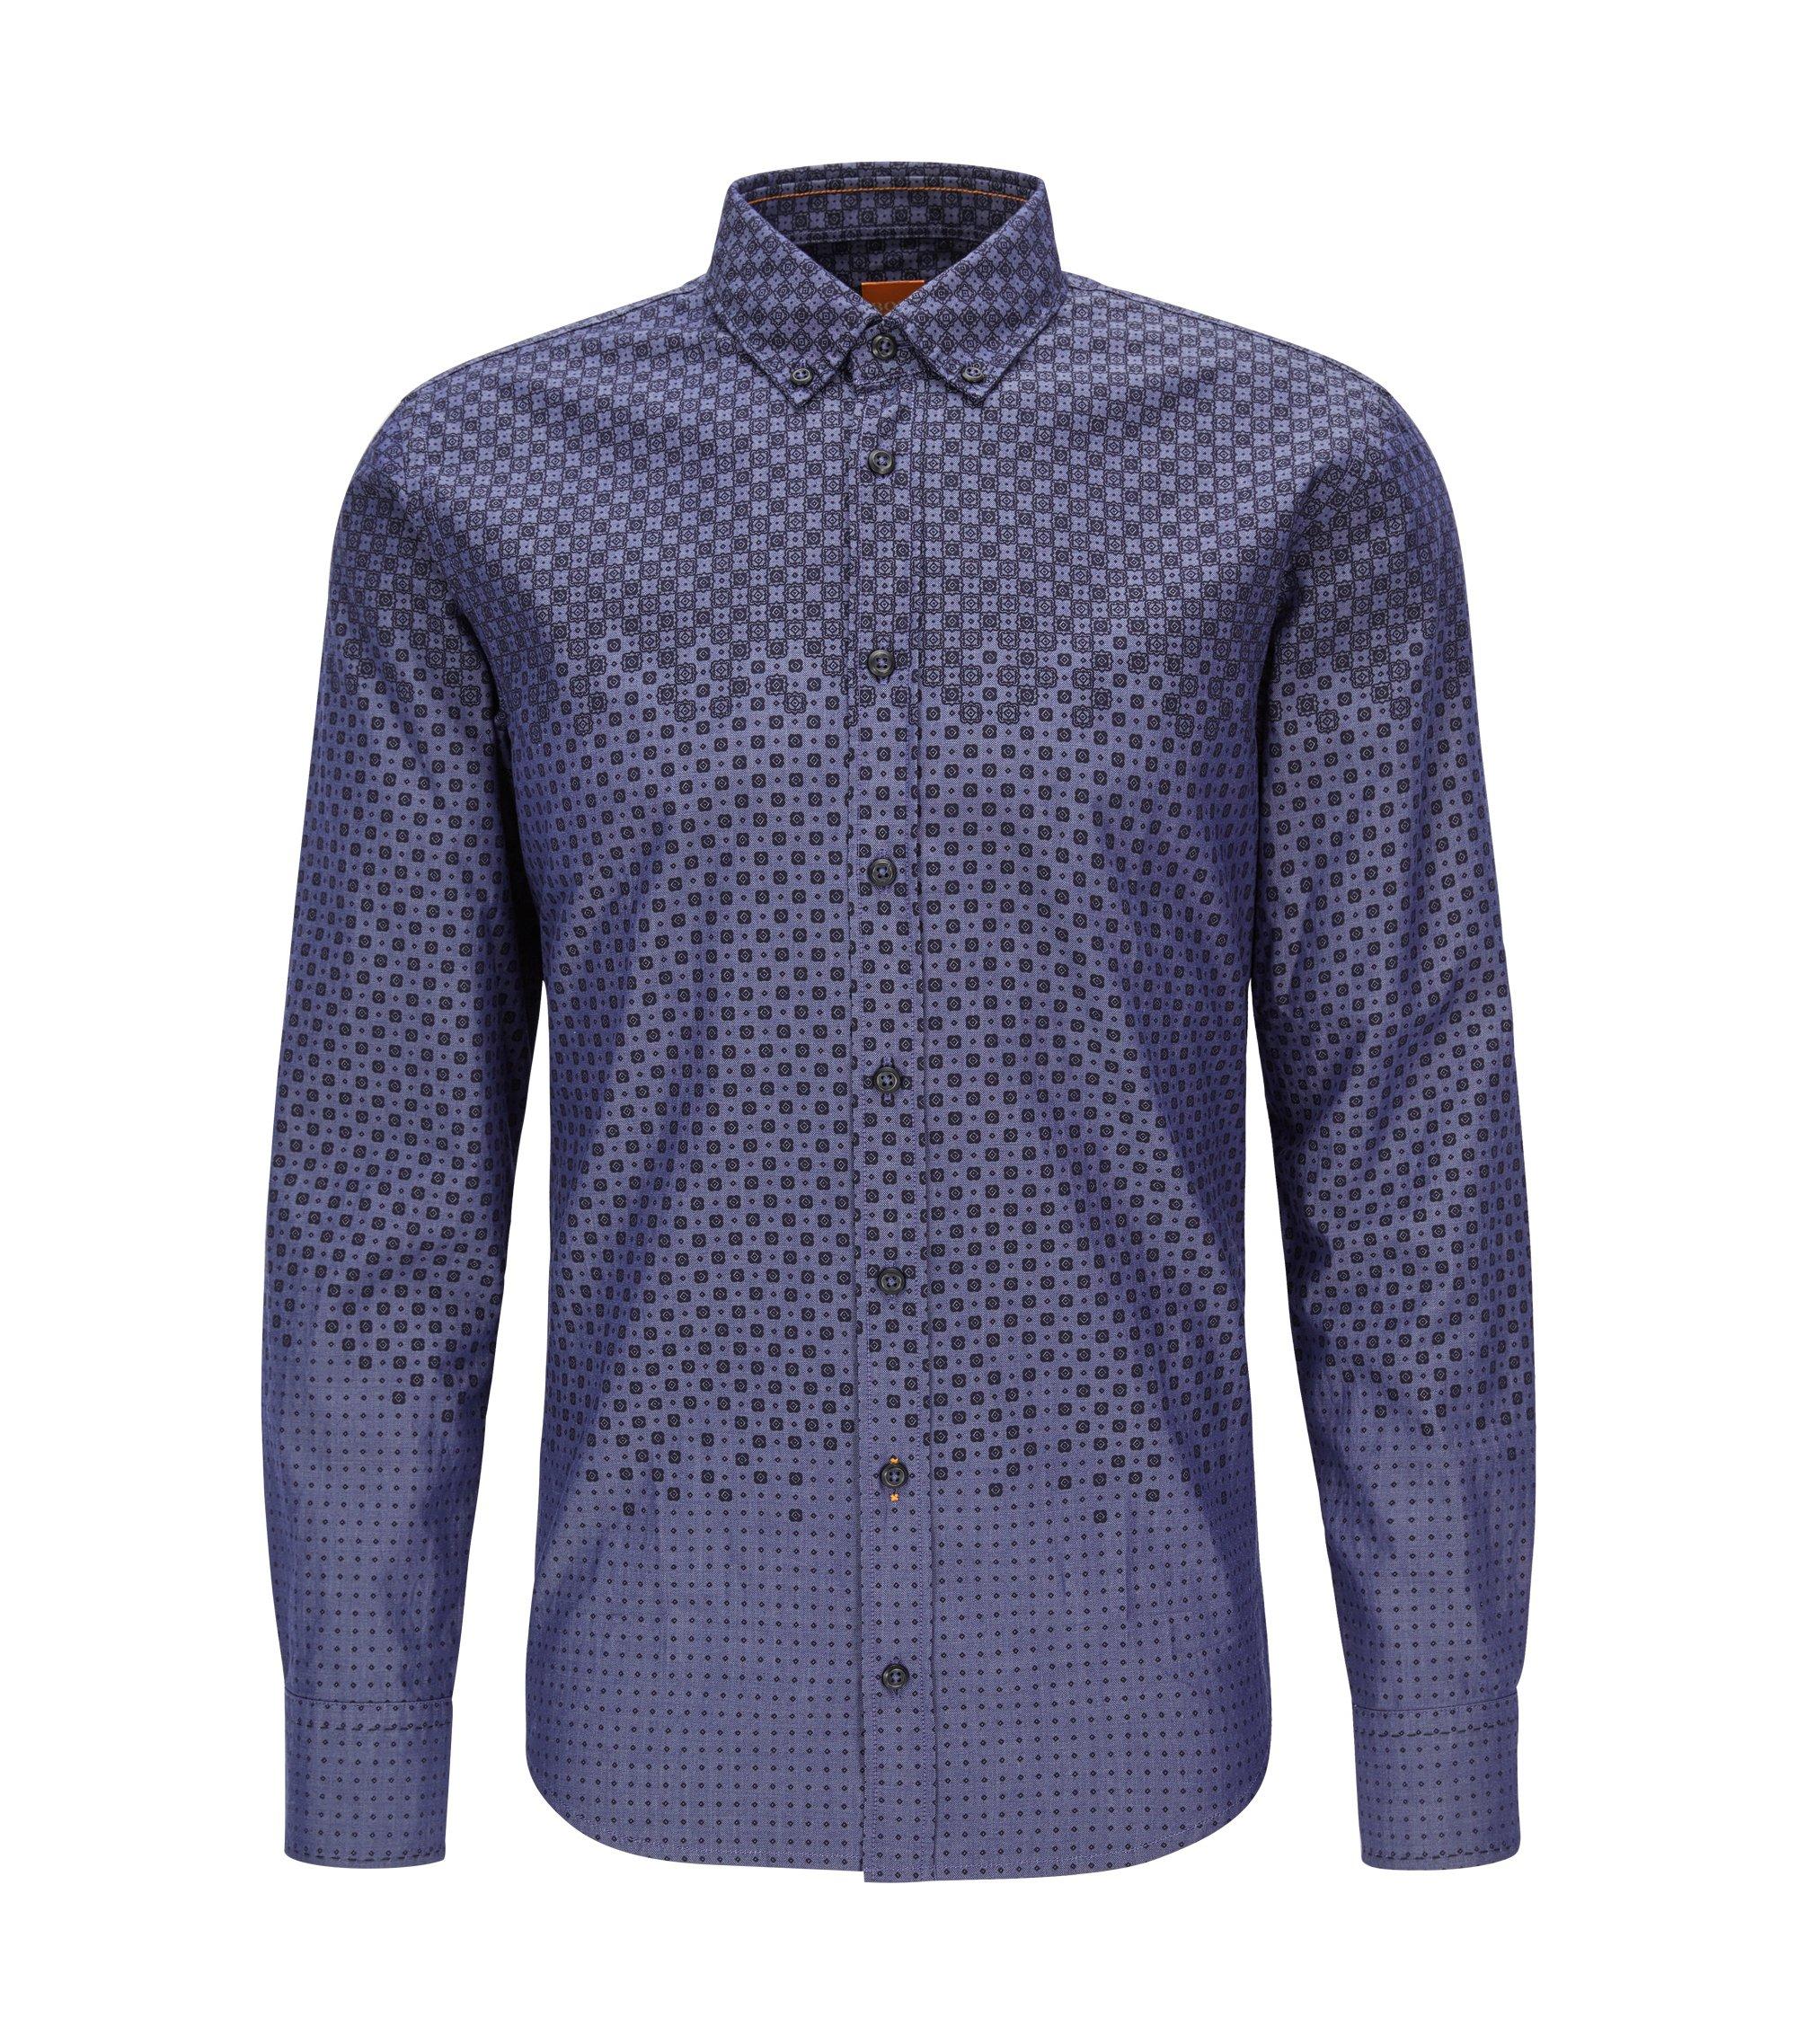 'Epreppy' | Slim Fit, Geometric Cotton Button Down Shirt, Dark Blue